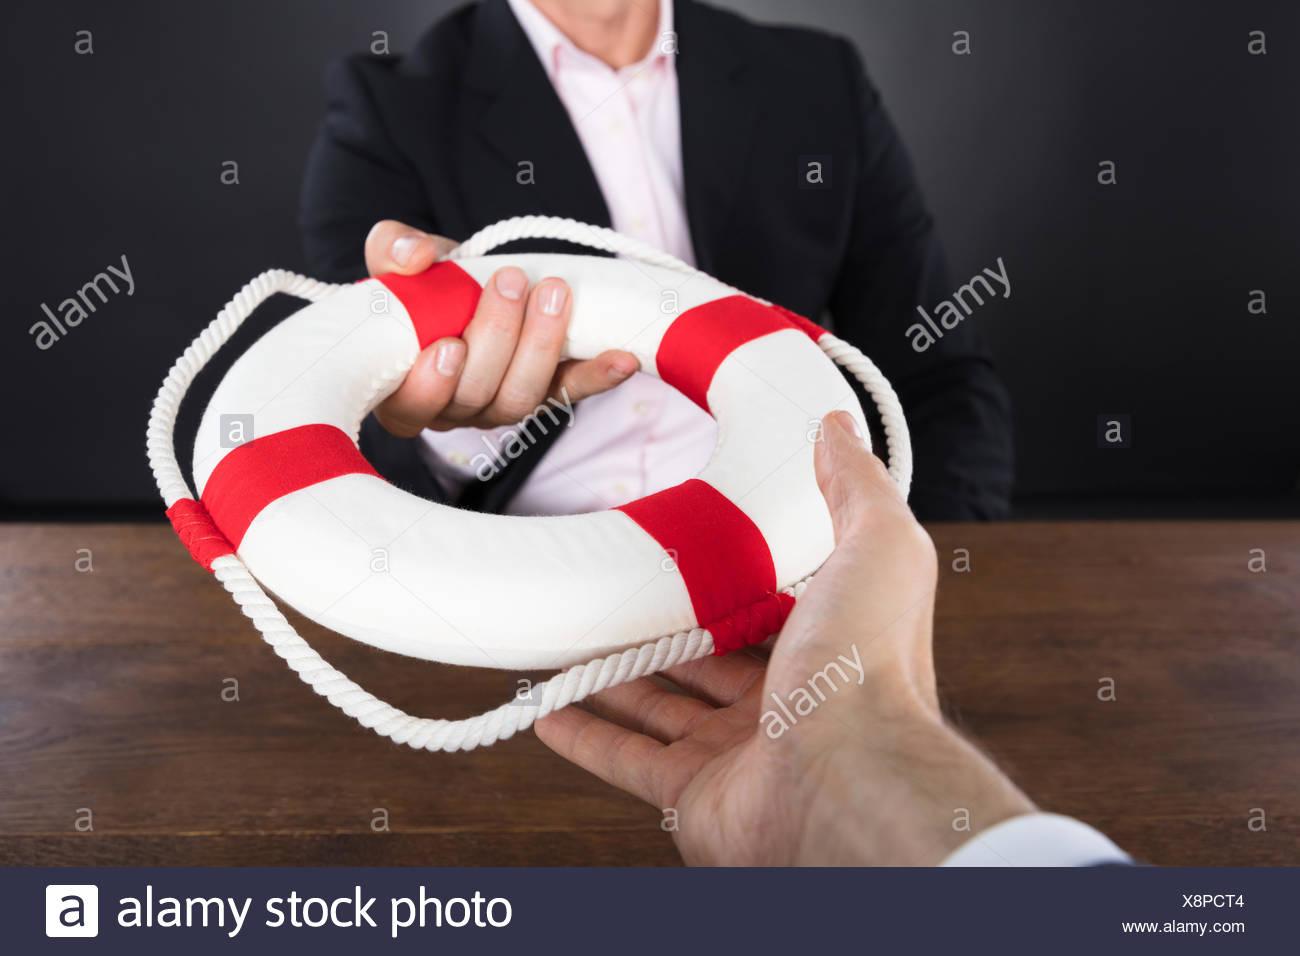 Businessman Passing A Lifebuoy To A Partner - Stock Image